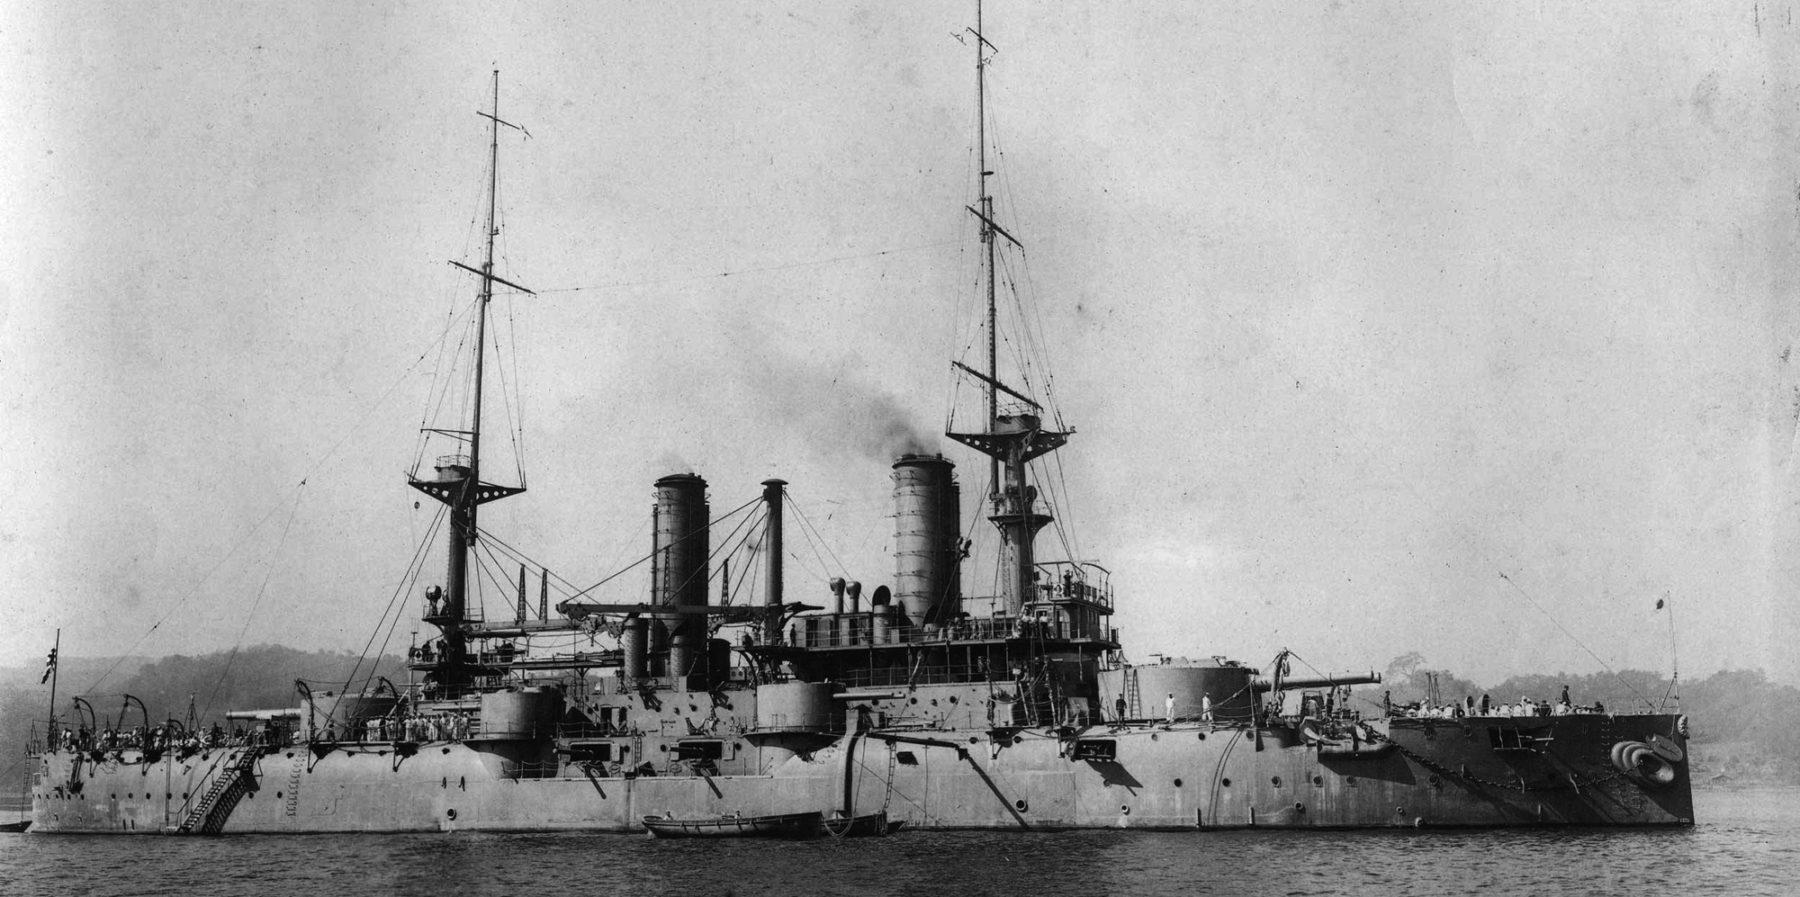 Petropavlovsk class battleships (1894)